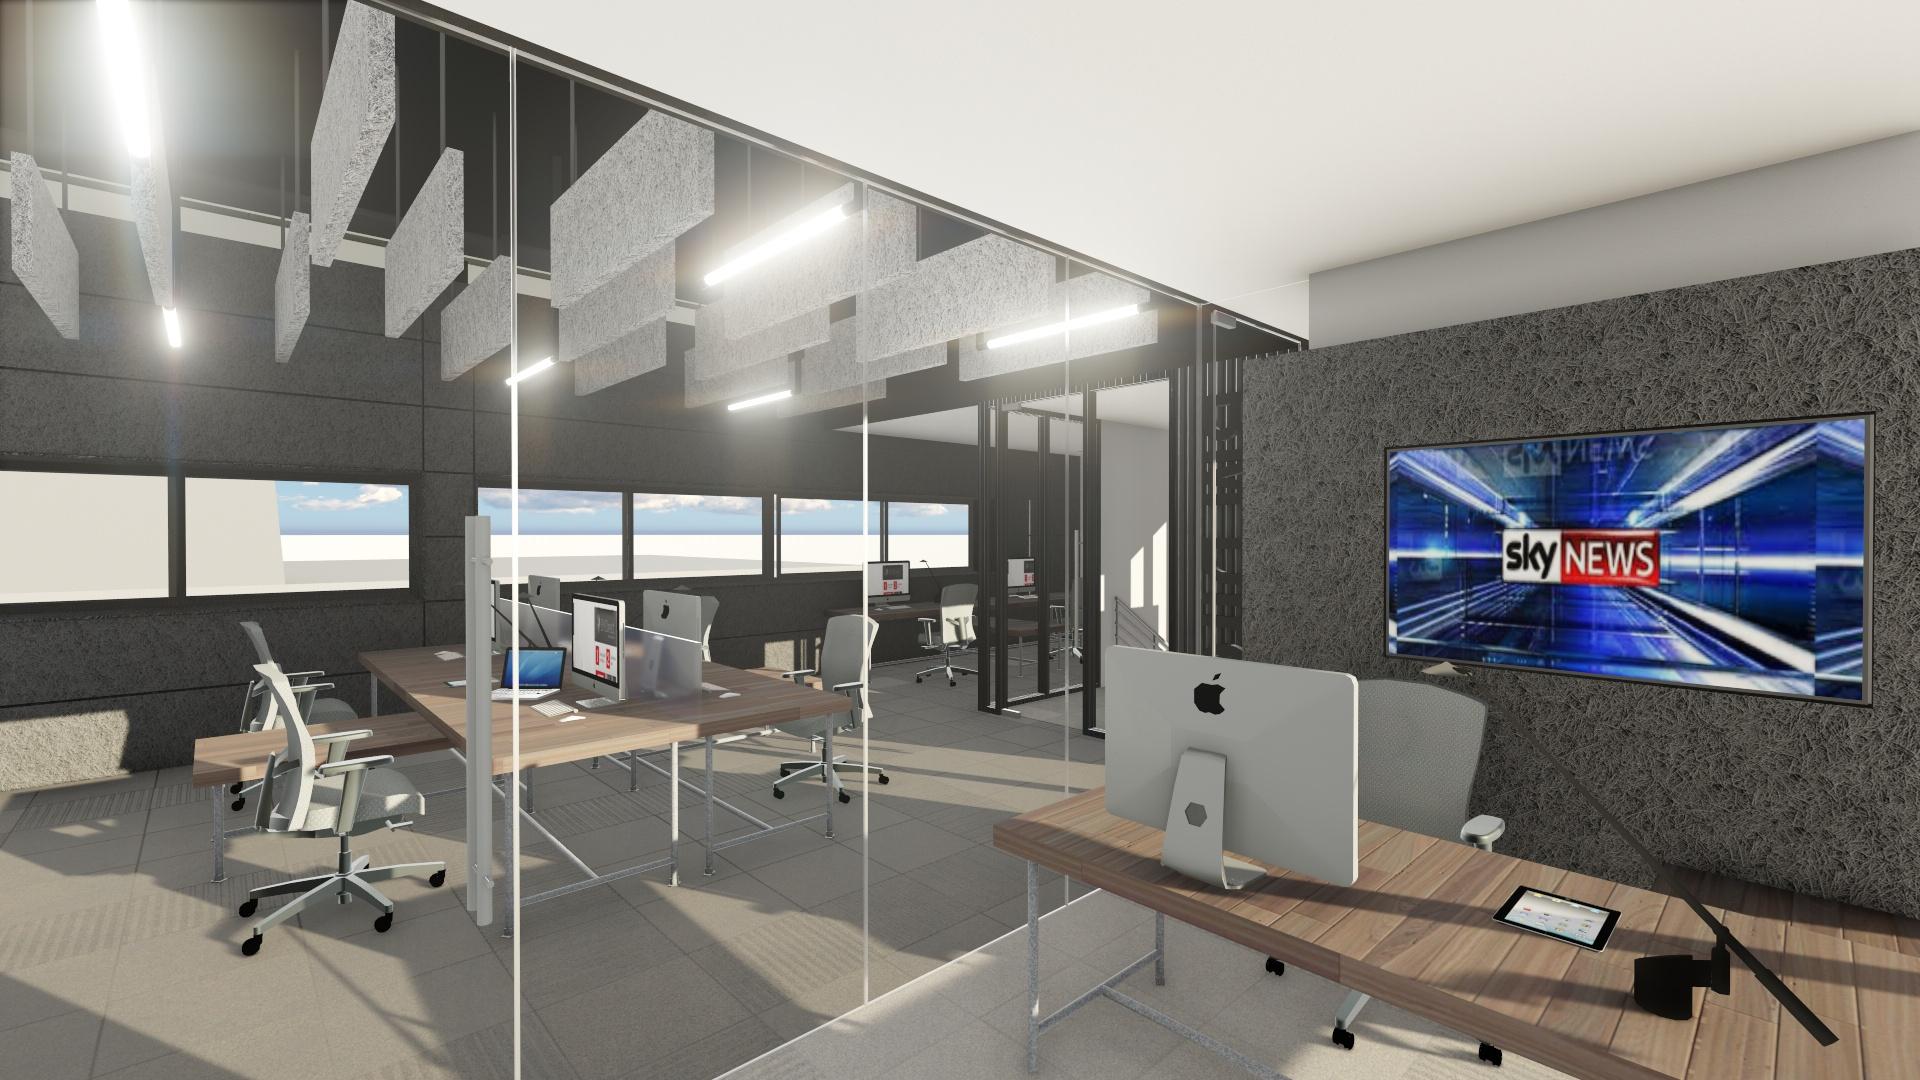 Carter- Zub - Feasibility Studies Office Plan